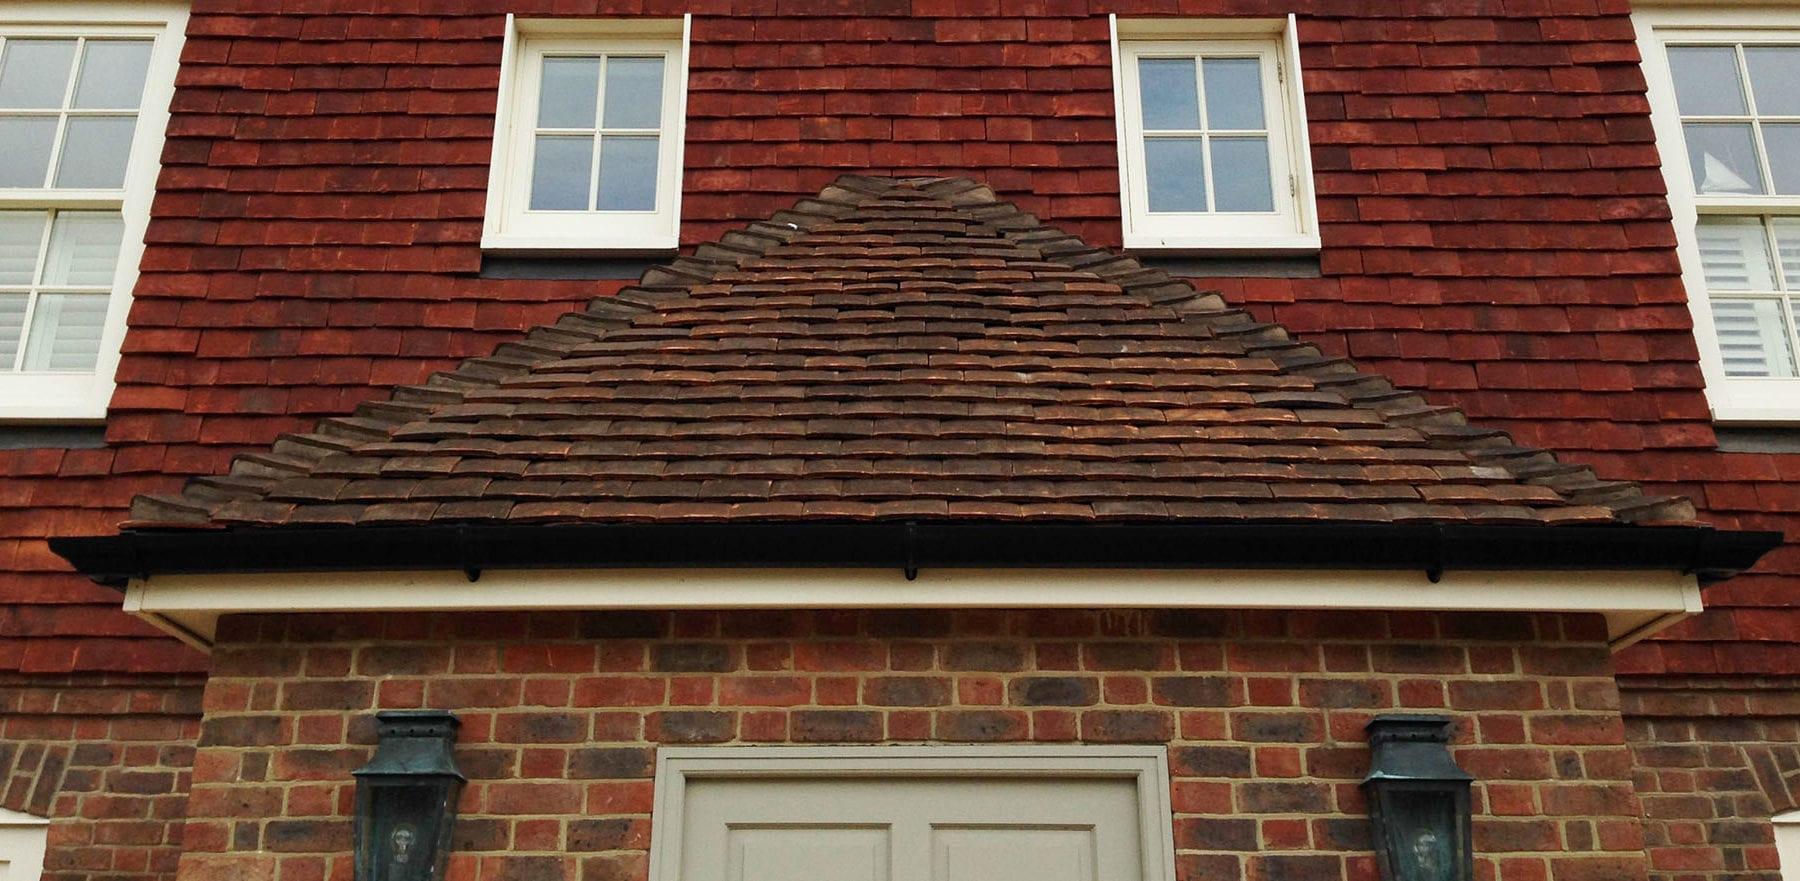 Lifestiles - Handmade Restoration Clay Roof Tiles - Chidham, England 3